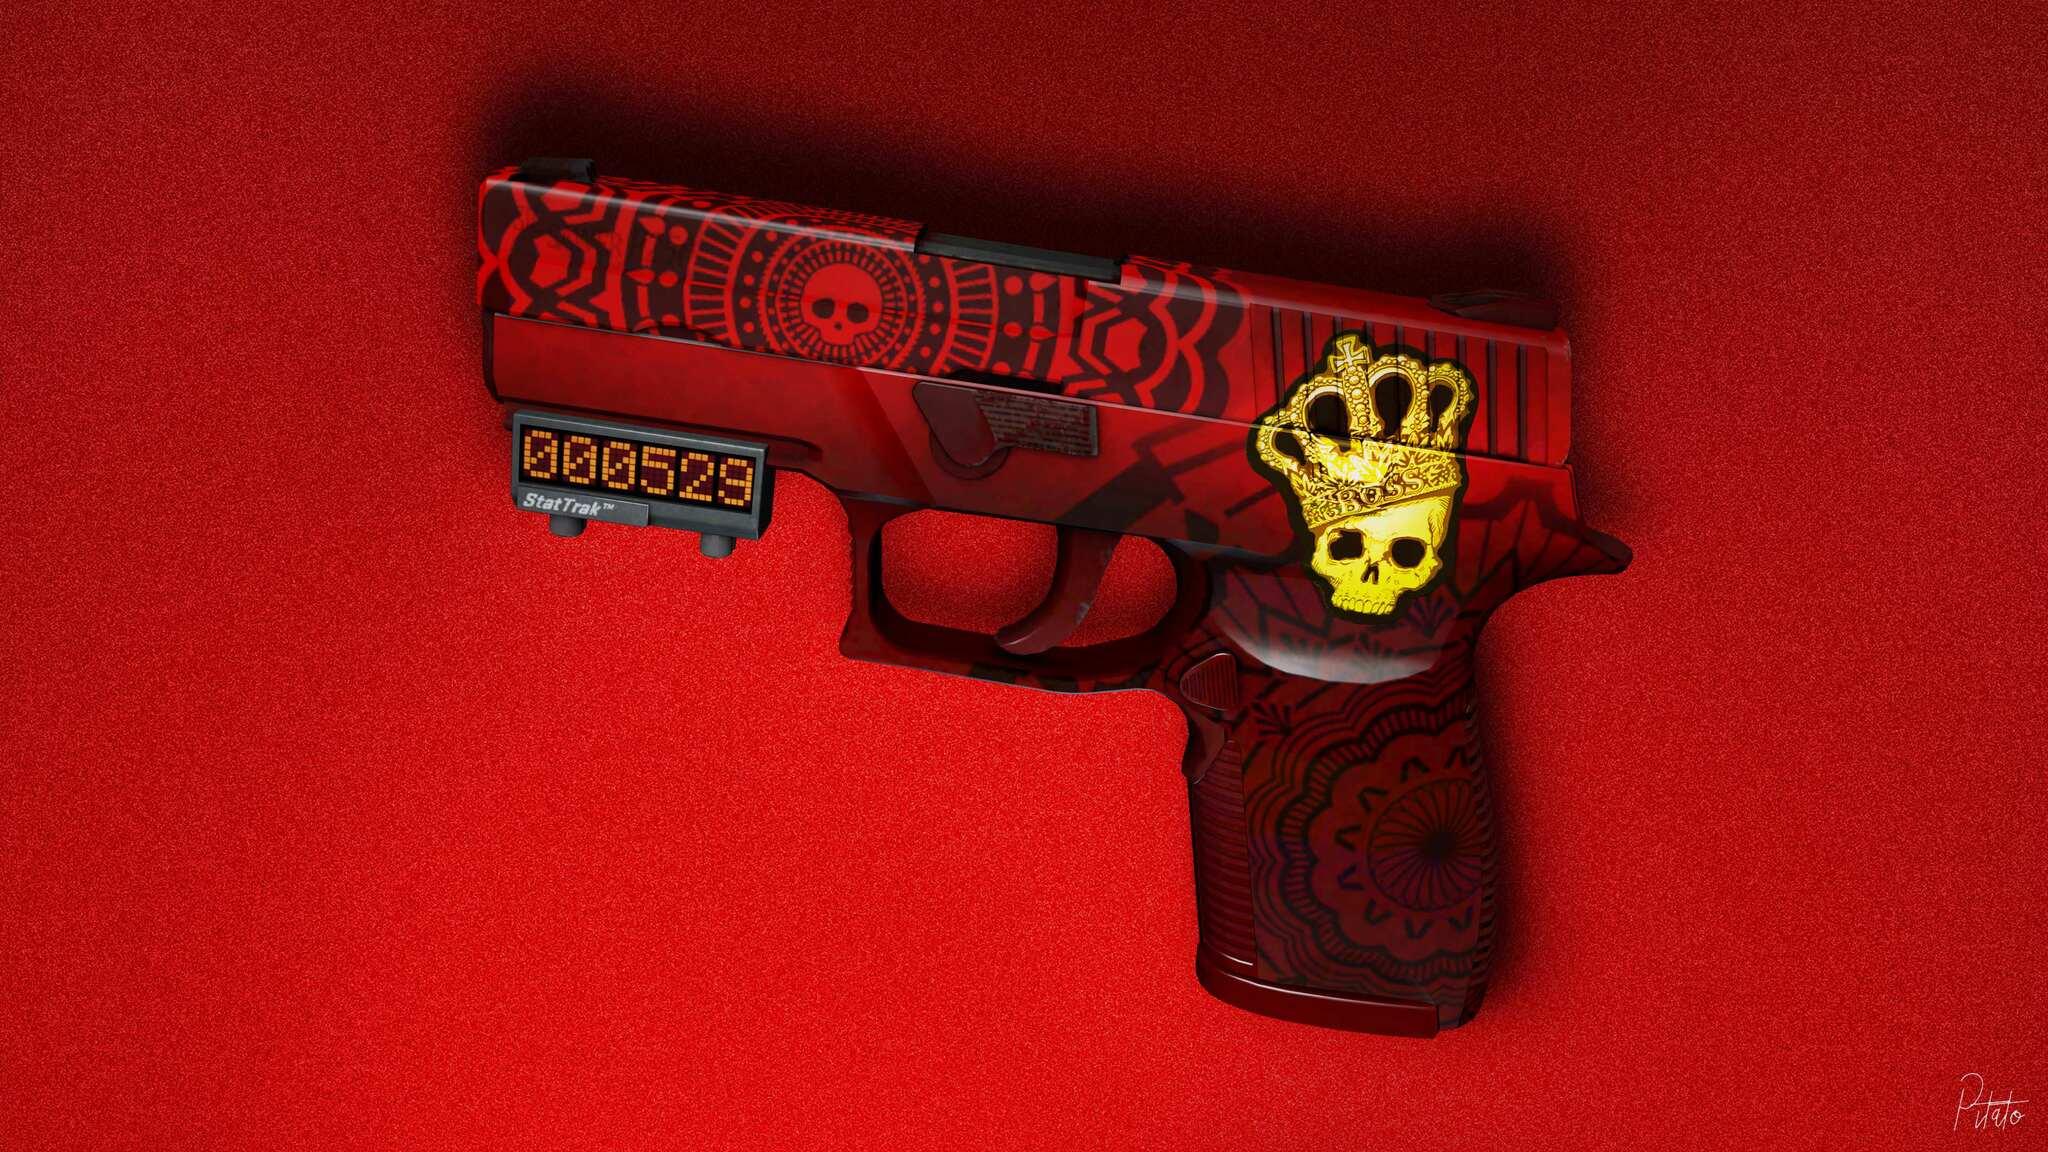 2048x1152 Skull Gun 4k 2048x1152 Resolution Hd 4k Wallpapers Images